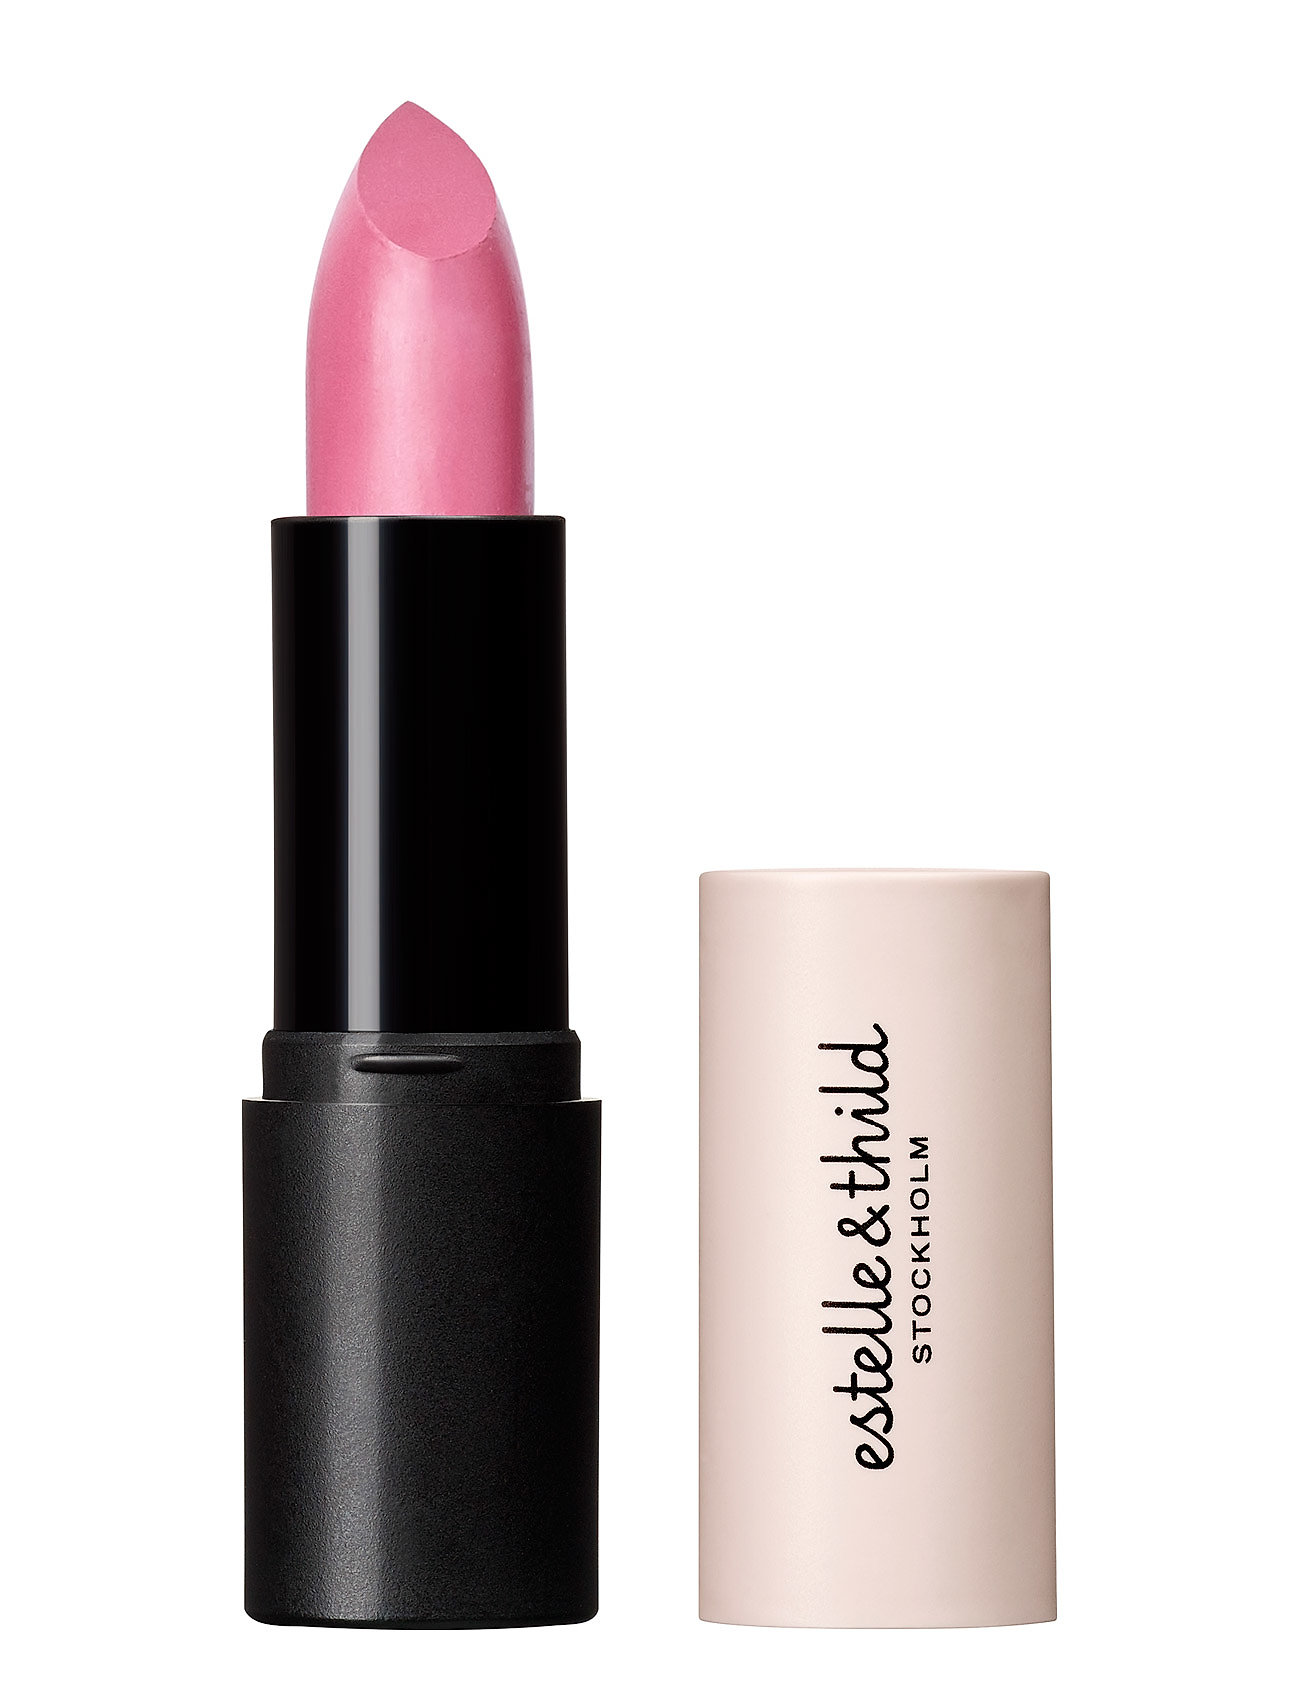 Biomineral Cream Lipstick Pretty Pink - Estelle & Thild